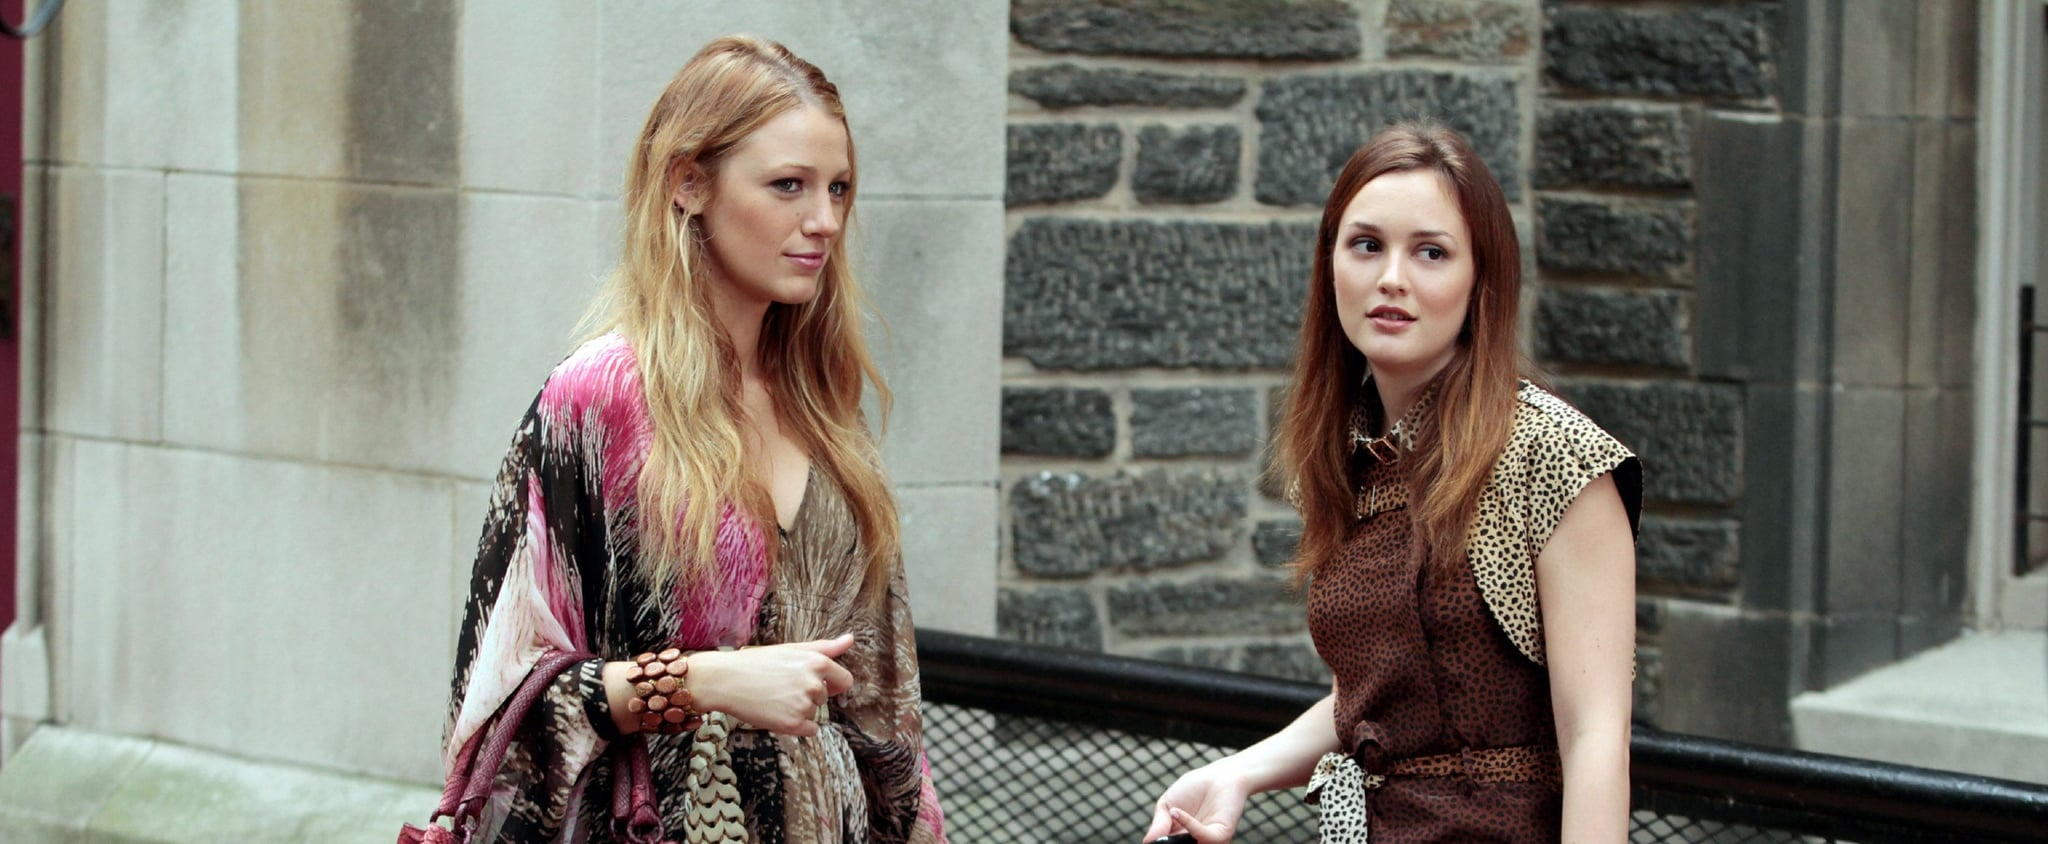 Will the Original Gossip Girl Cast Be in the Reboot?